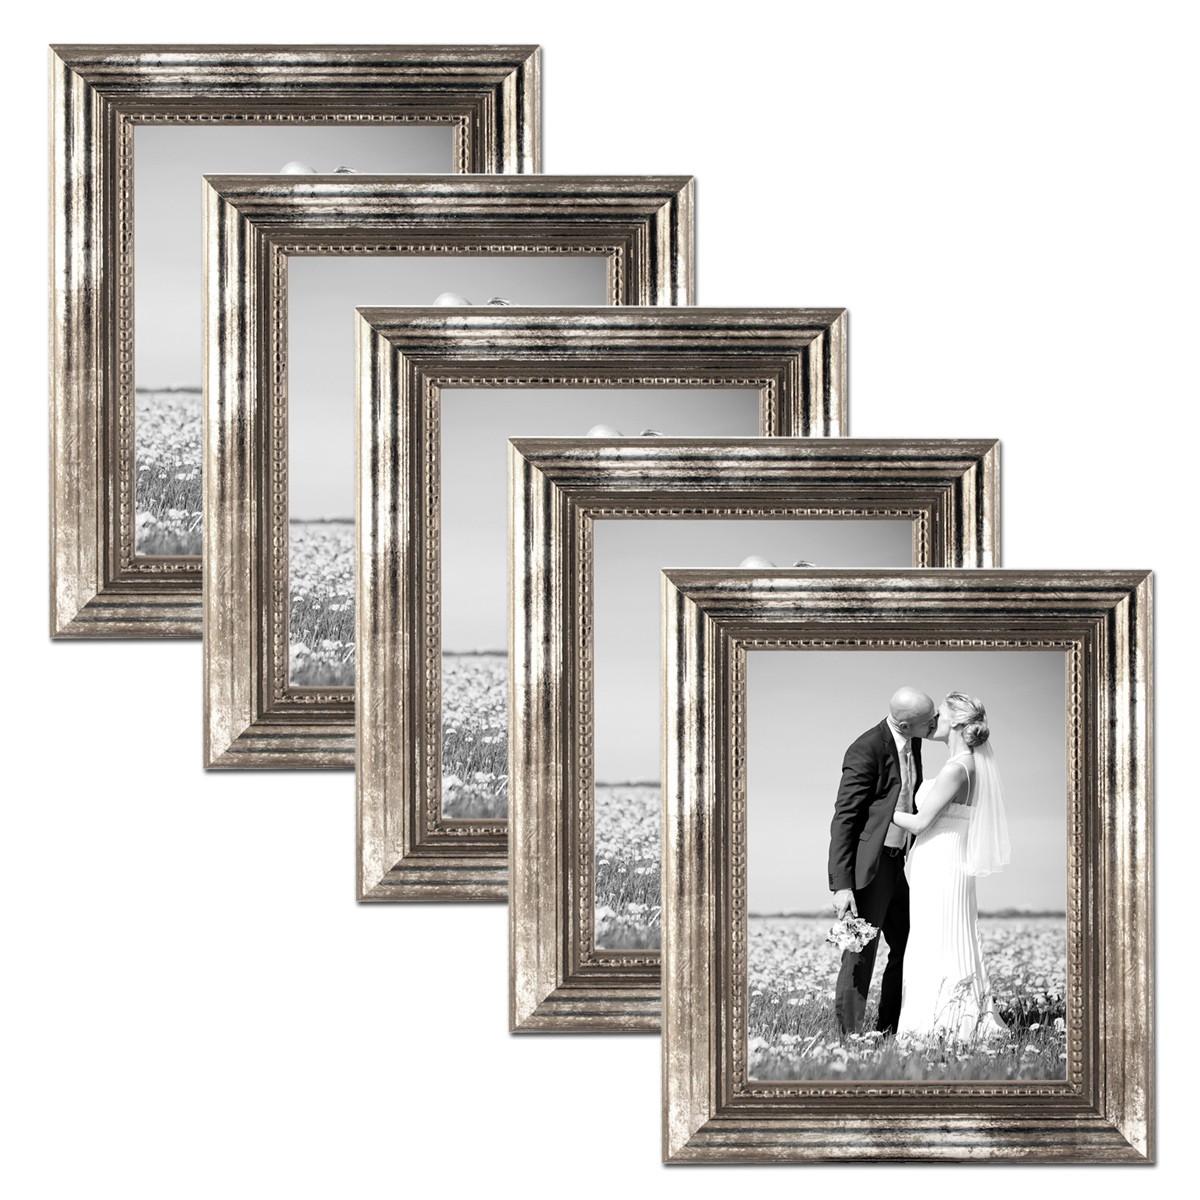 5er set bilderrahmen 10x15 cm silber barock antik massivholz mit